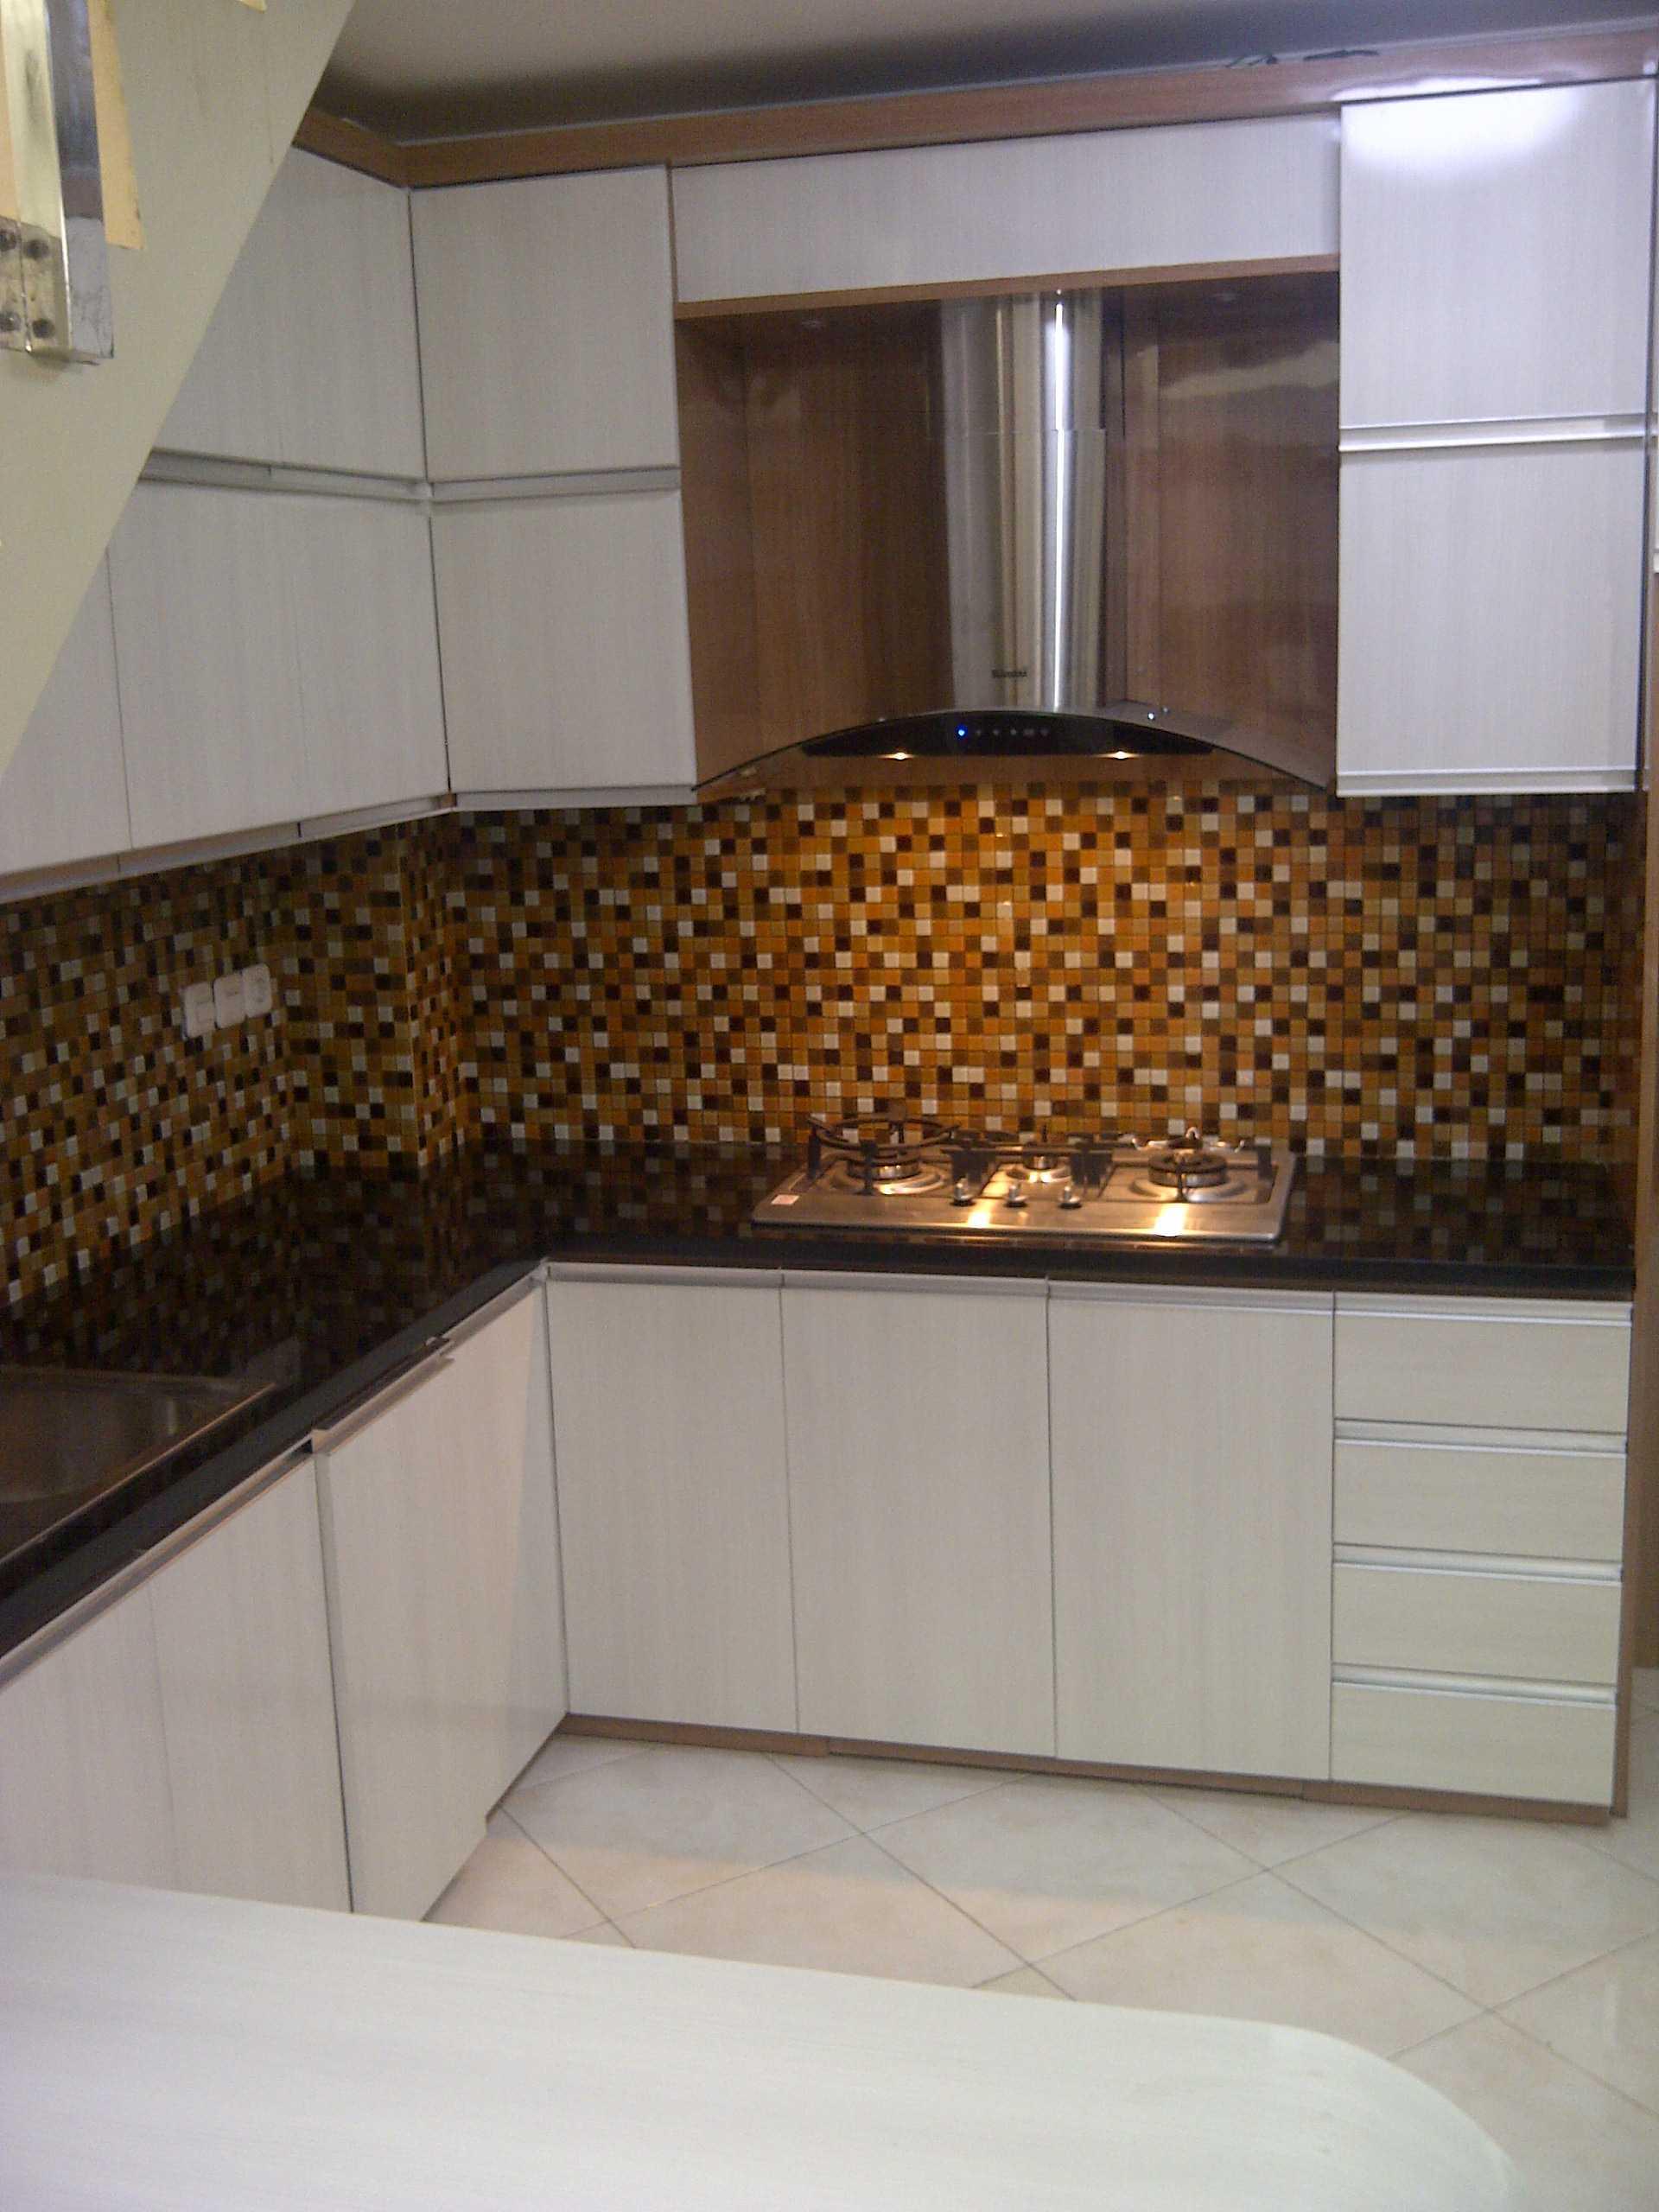 4 Sisi Indonesia Kitchen Set Bandung City, West Java, Indonesia  Img-20130513-00566   34539